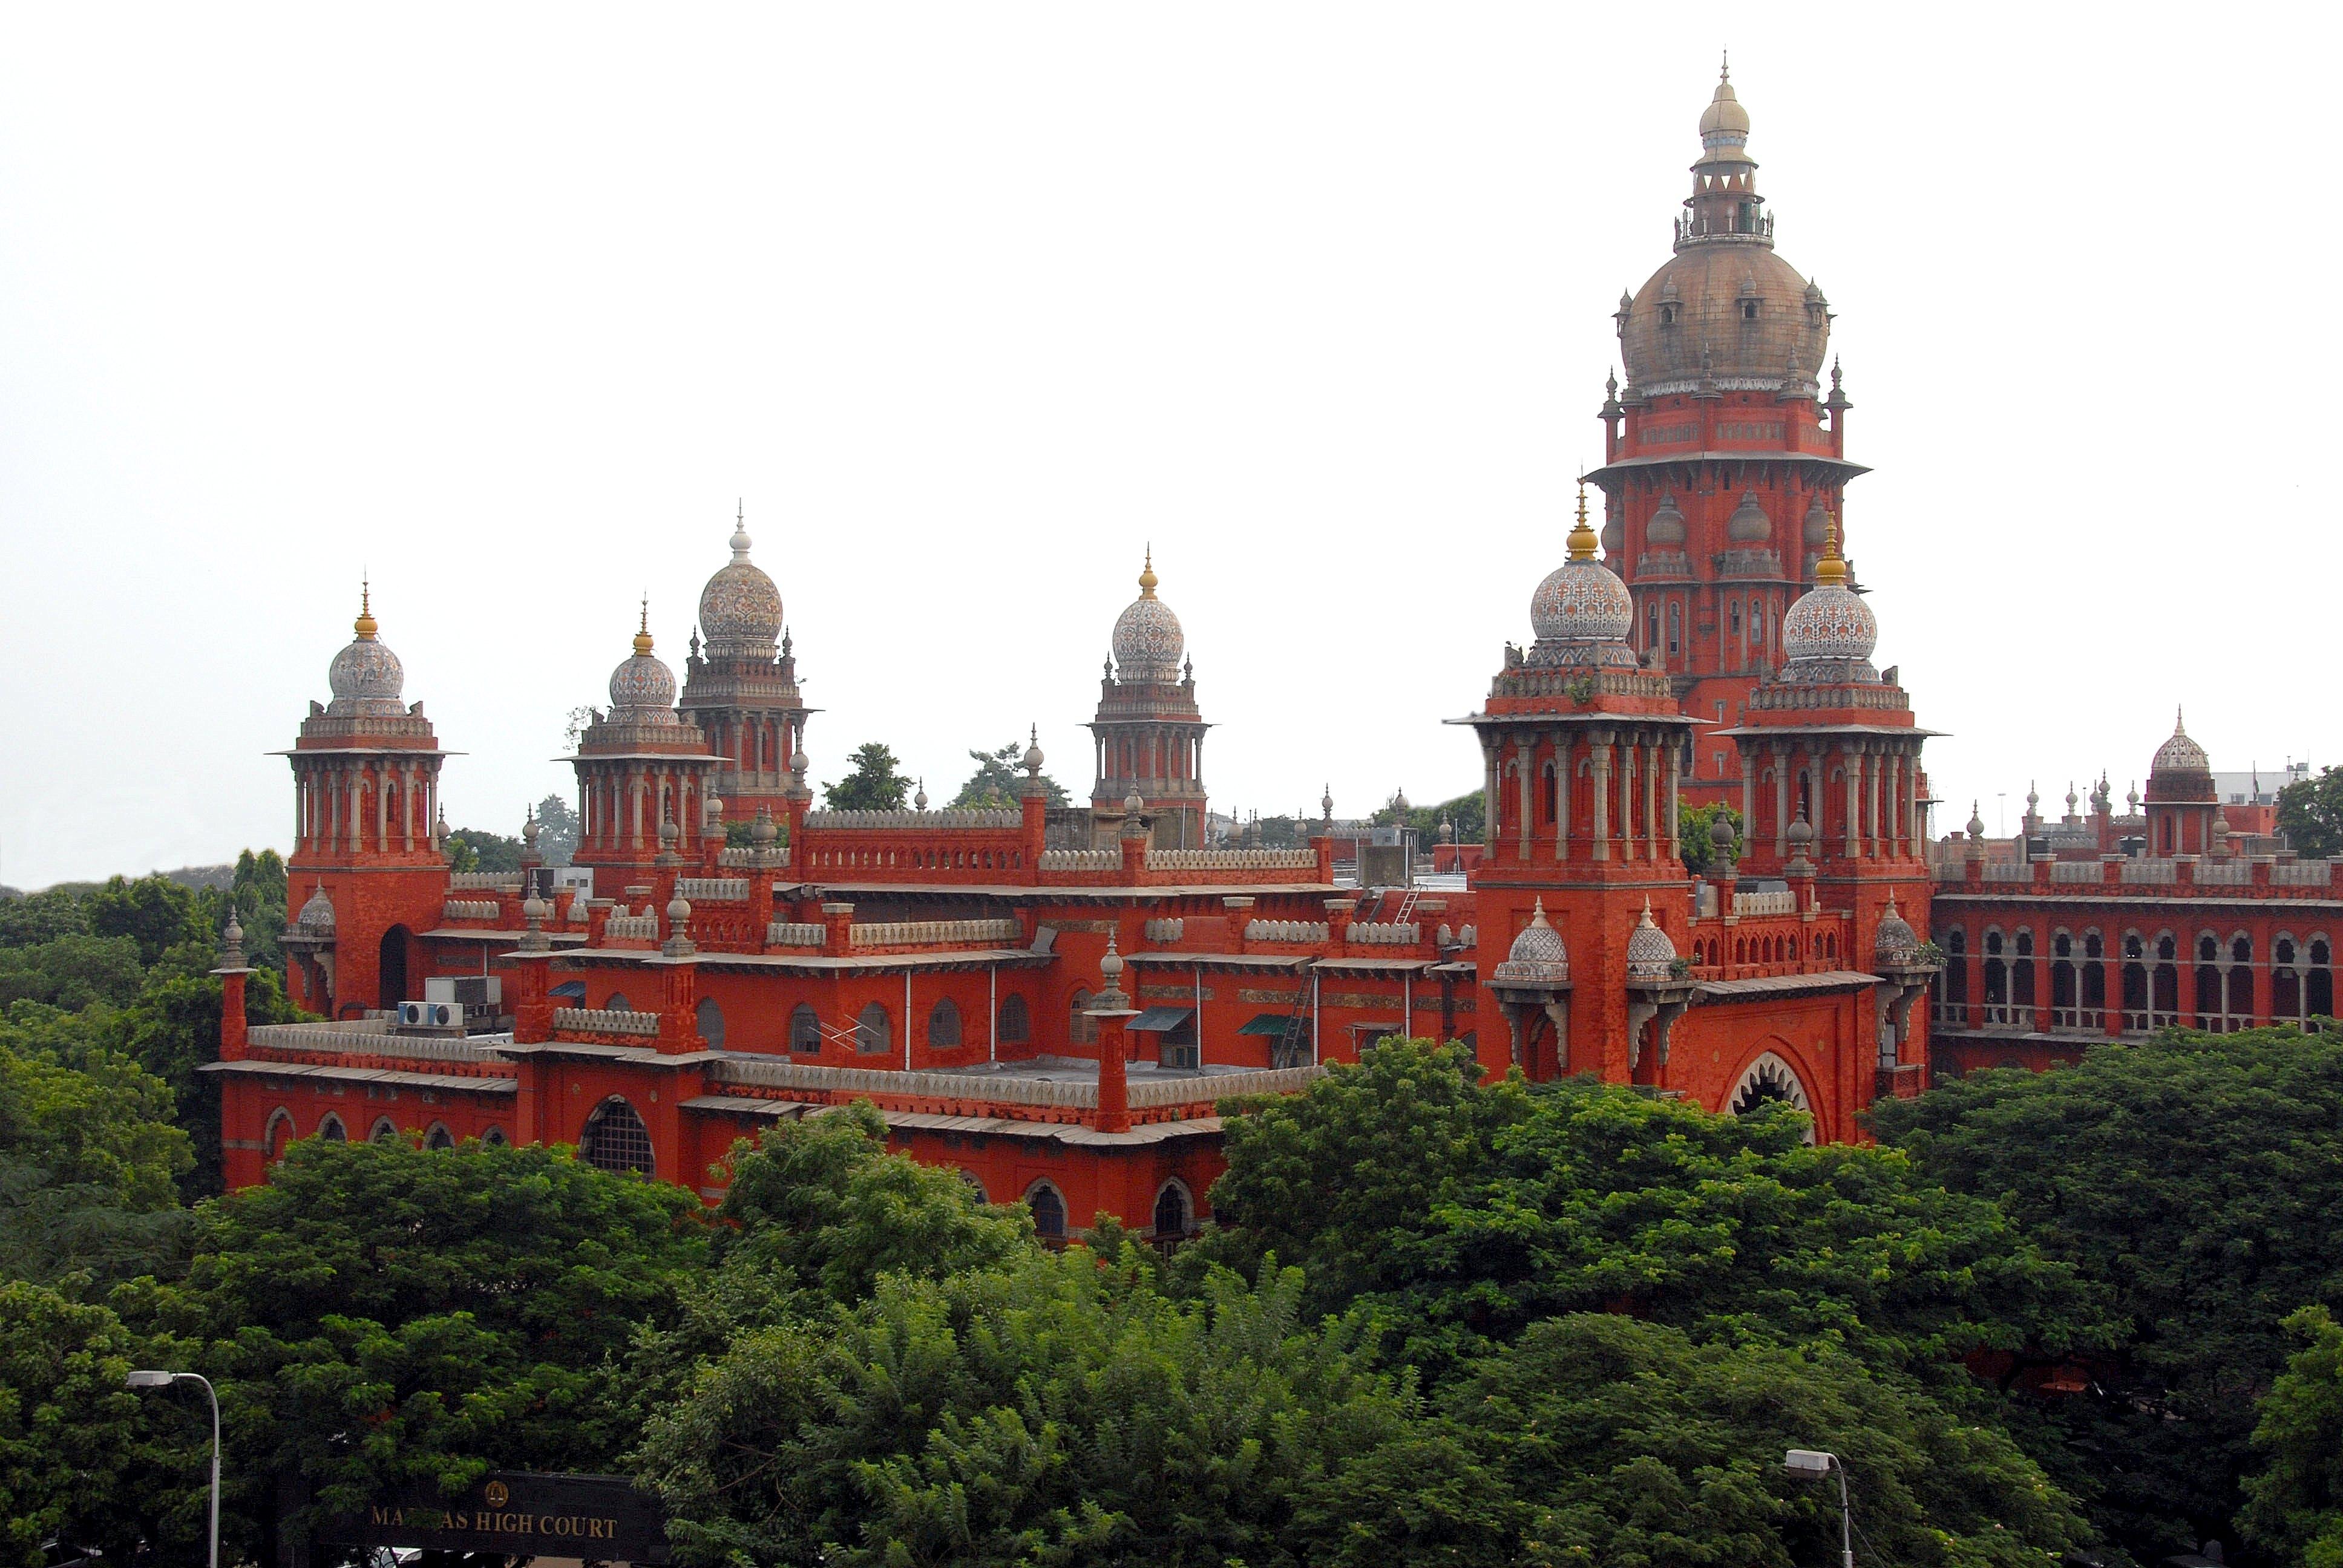 chennai high court க்கான பட முடிவு